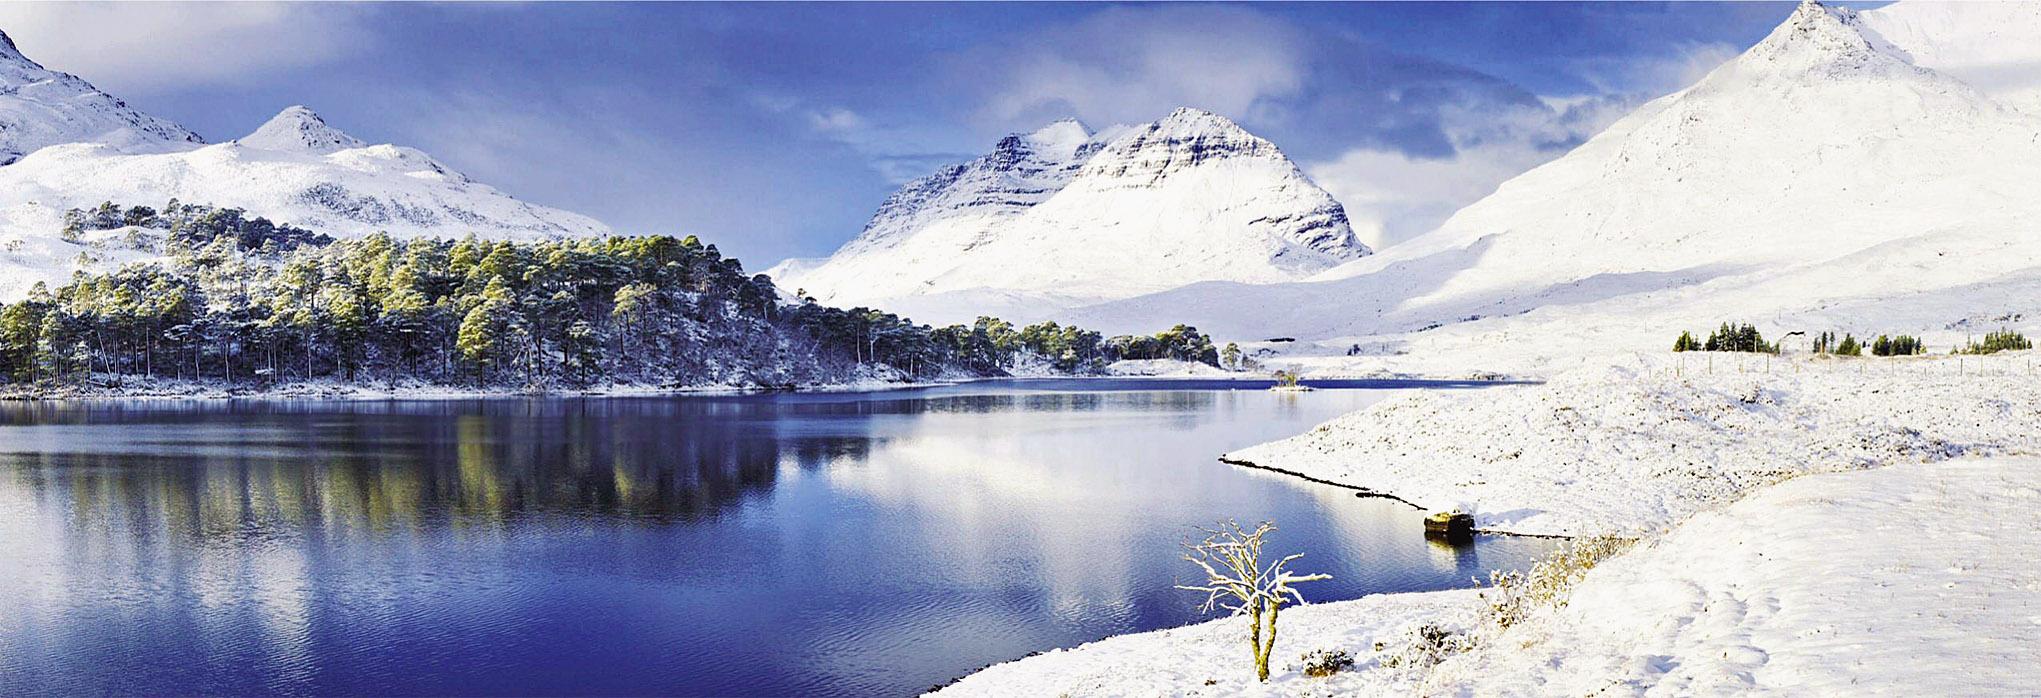 Liathach in the Torridon Hills, Highland, Scotland.jpg